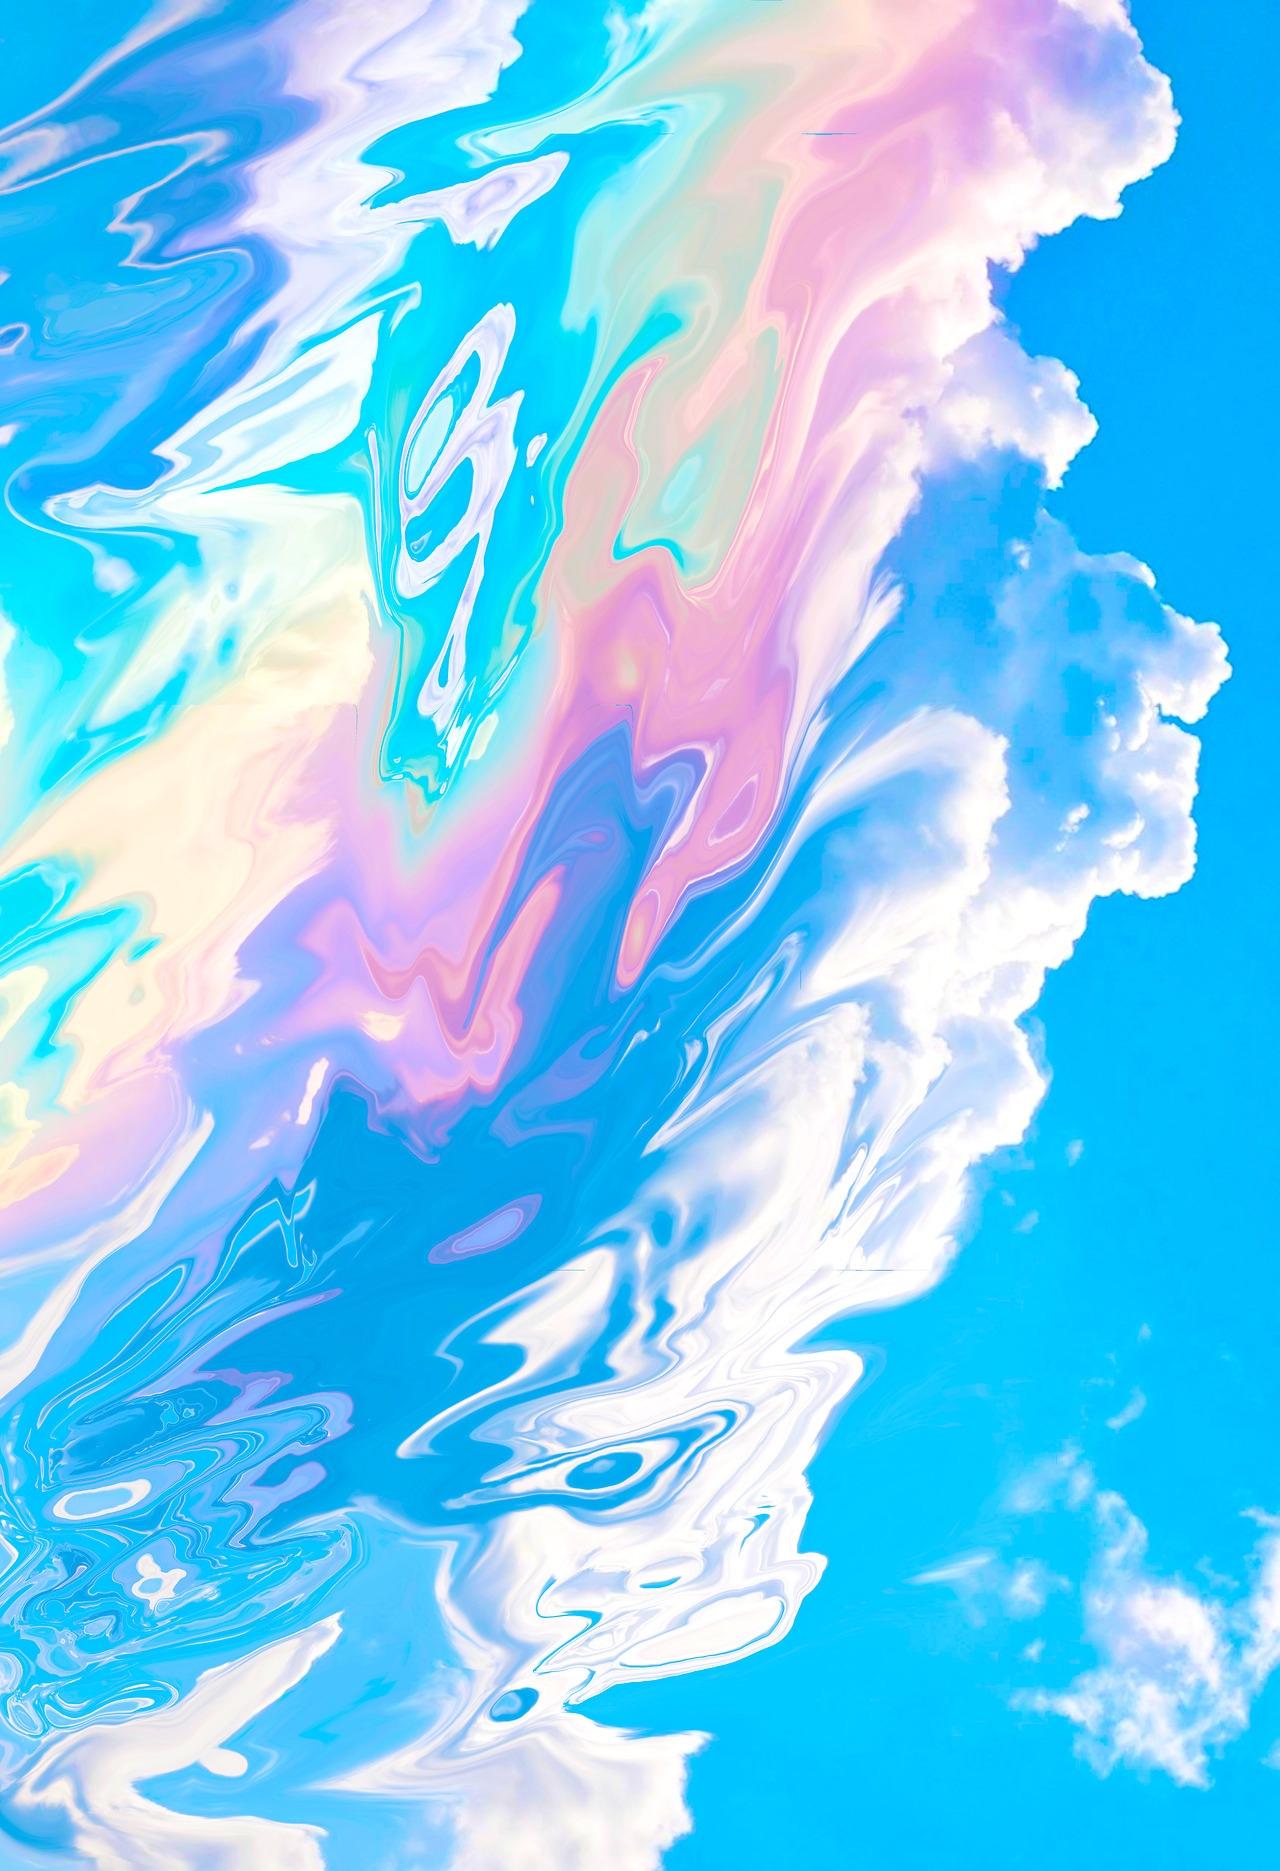 love creating vibrant summer th - tylerspangler   ello